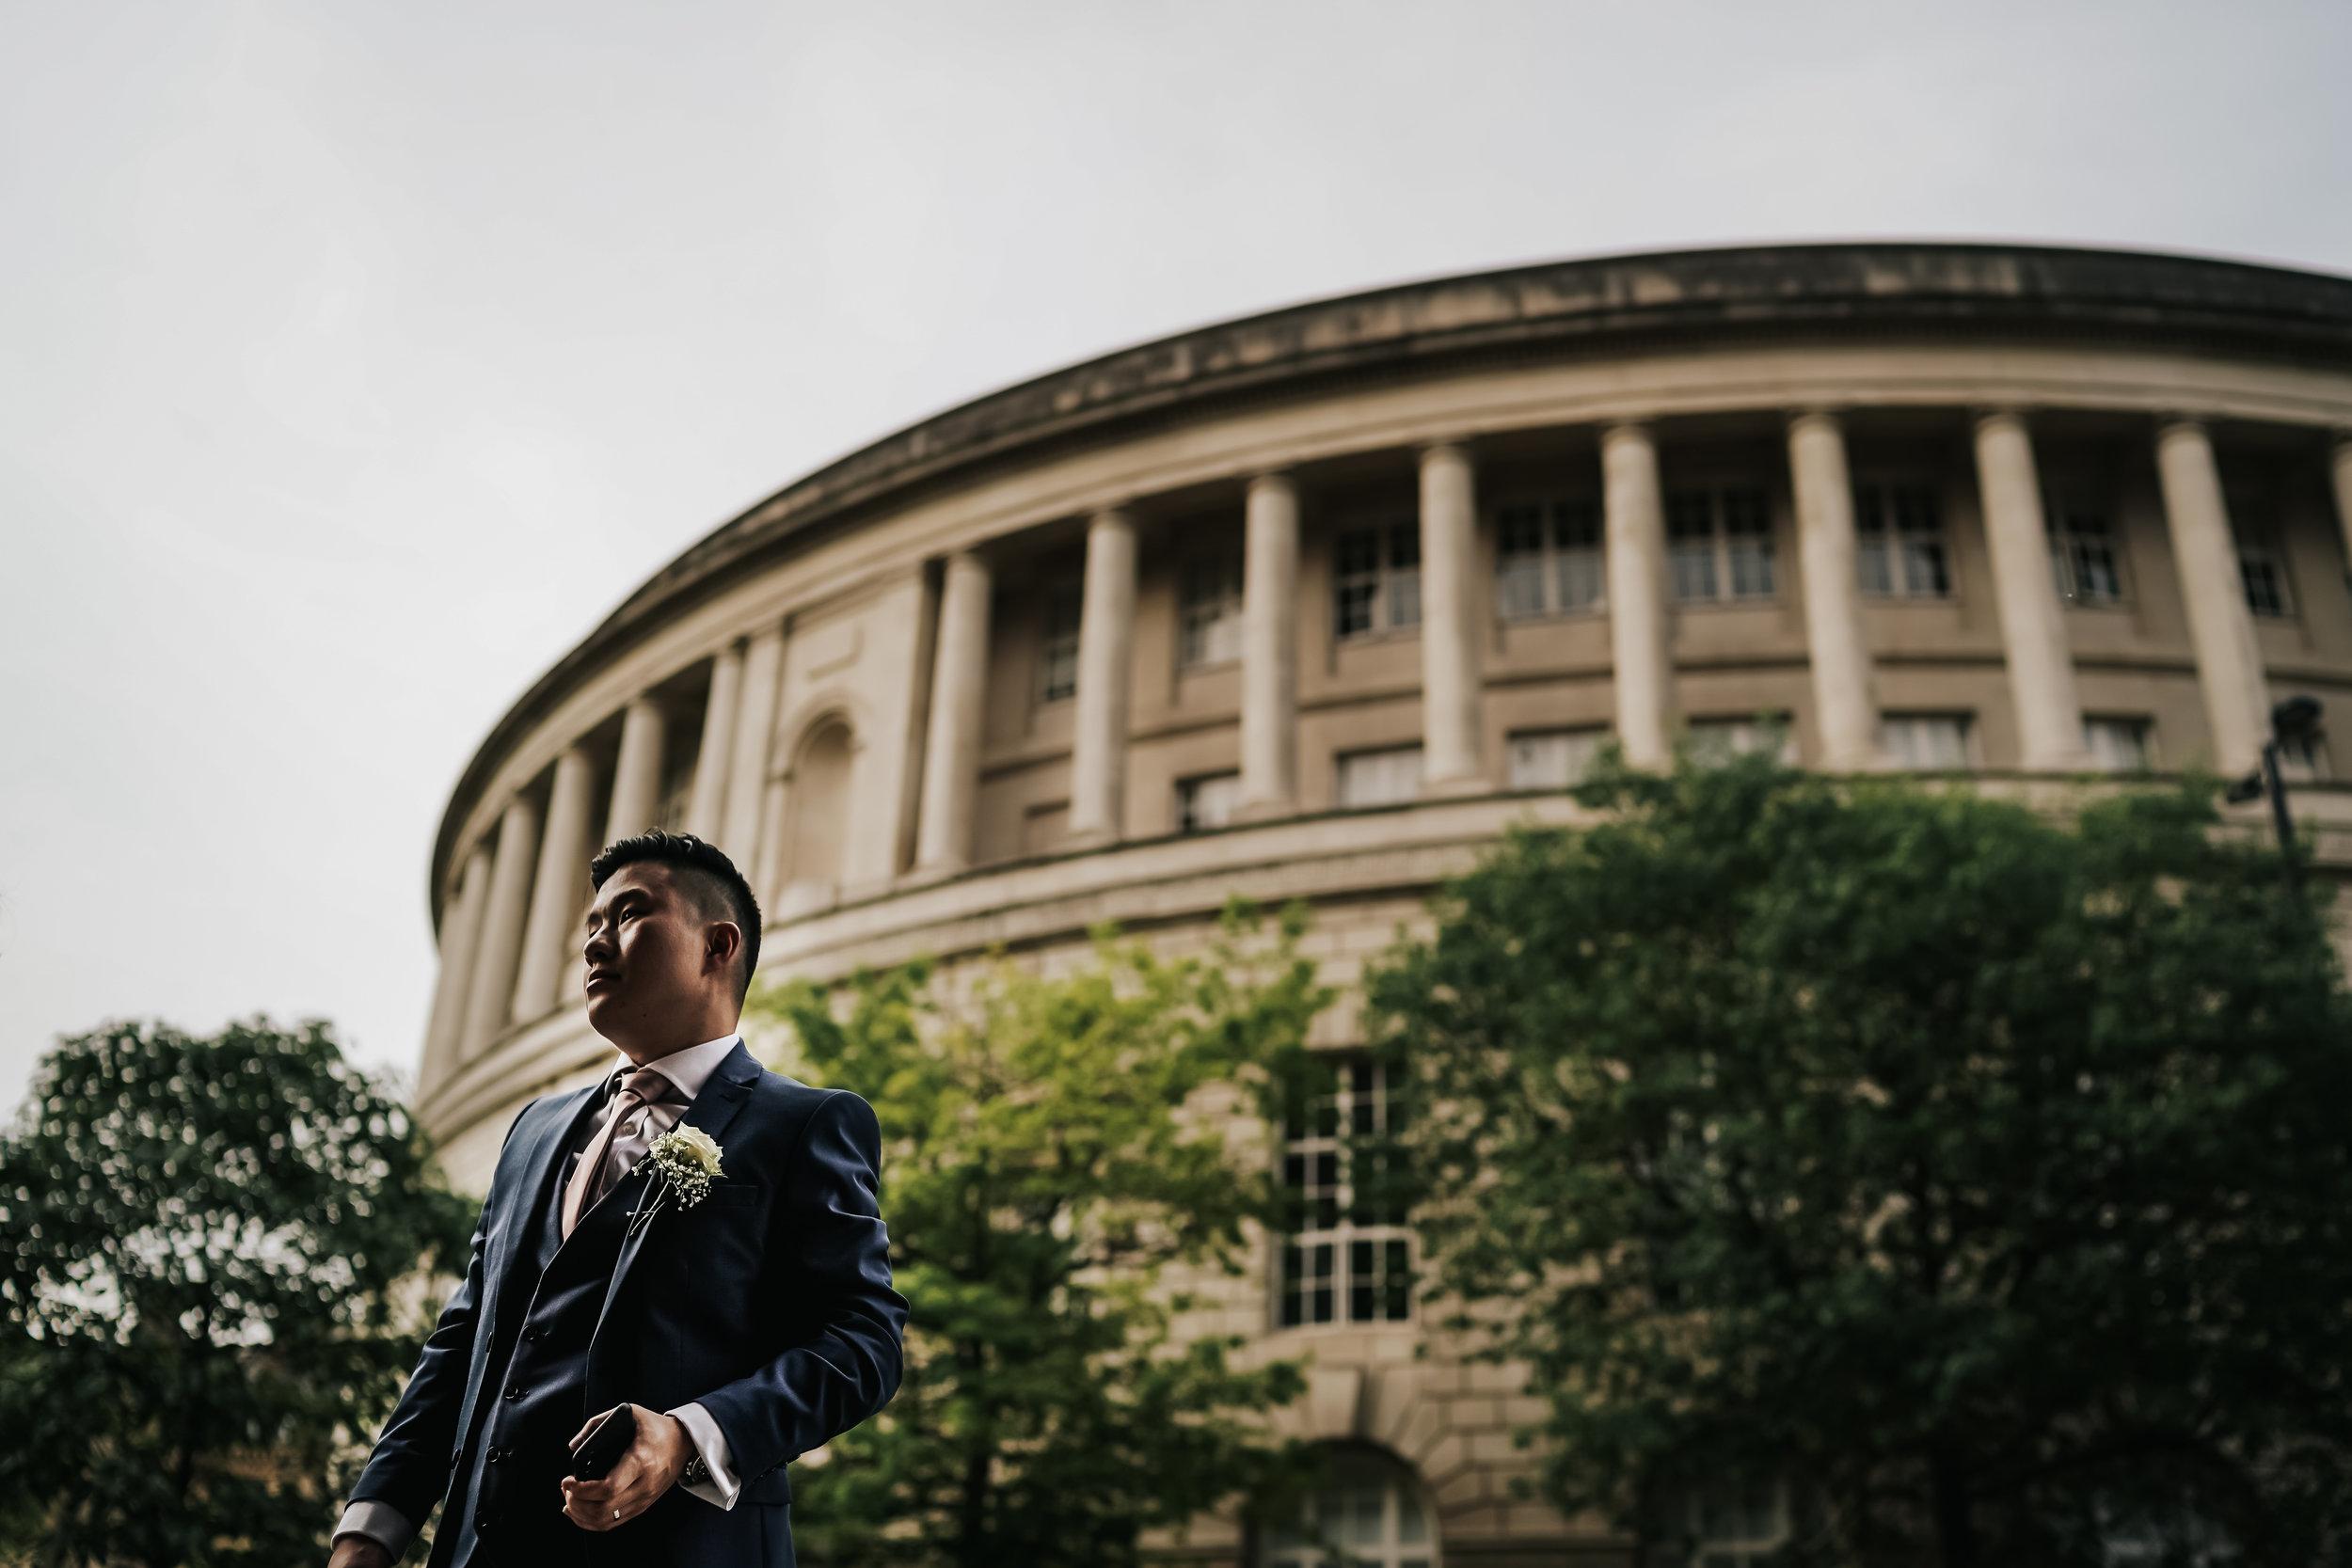 Chinese Wedding Photography Manchester wedding photographer Cheshire - 048.jpg